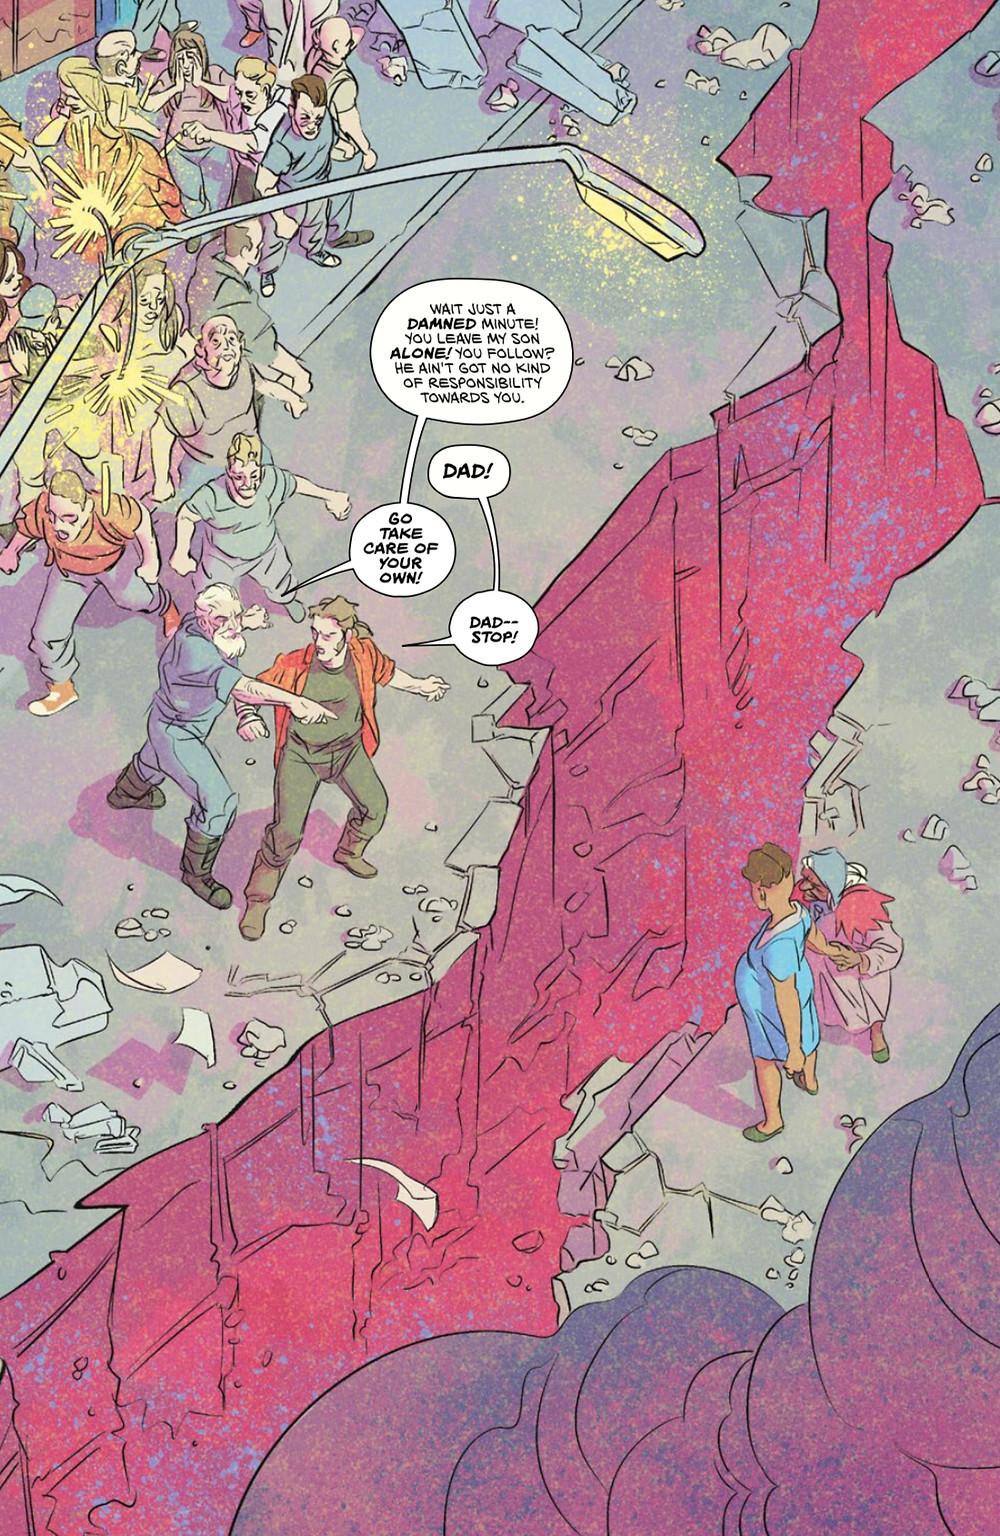 Fissure, Vol.1, page 24, Vault Comics, Daniel/Delpeche